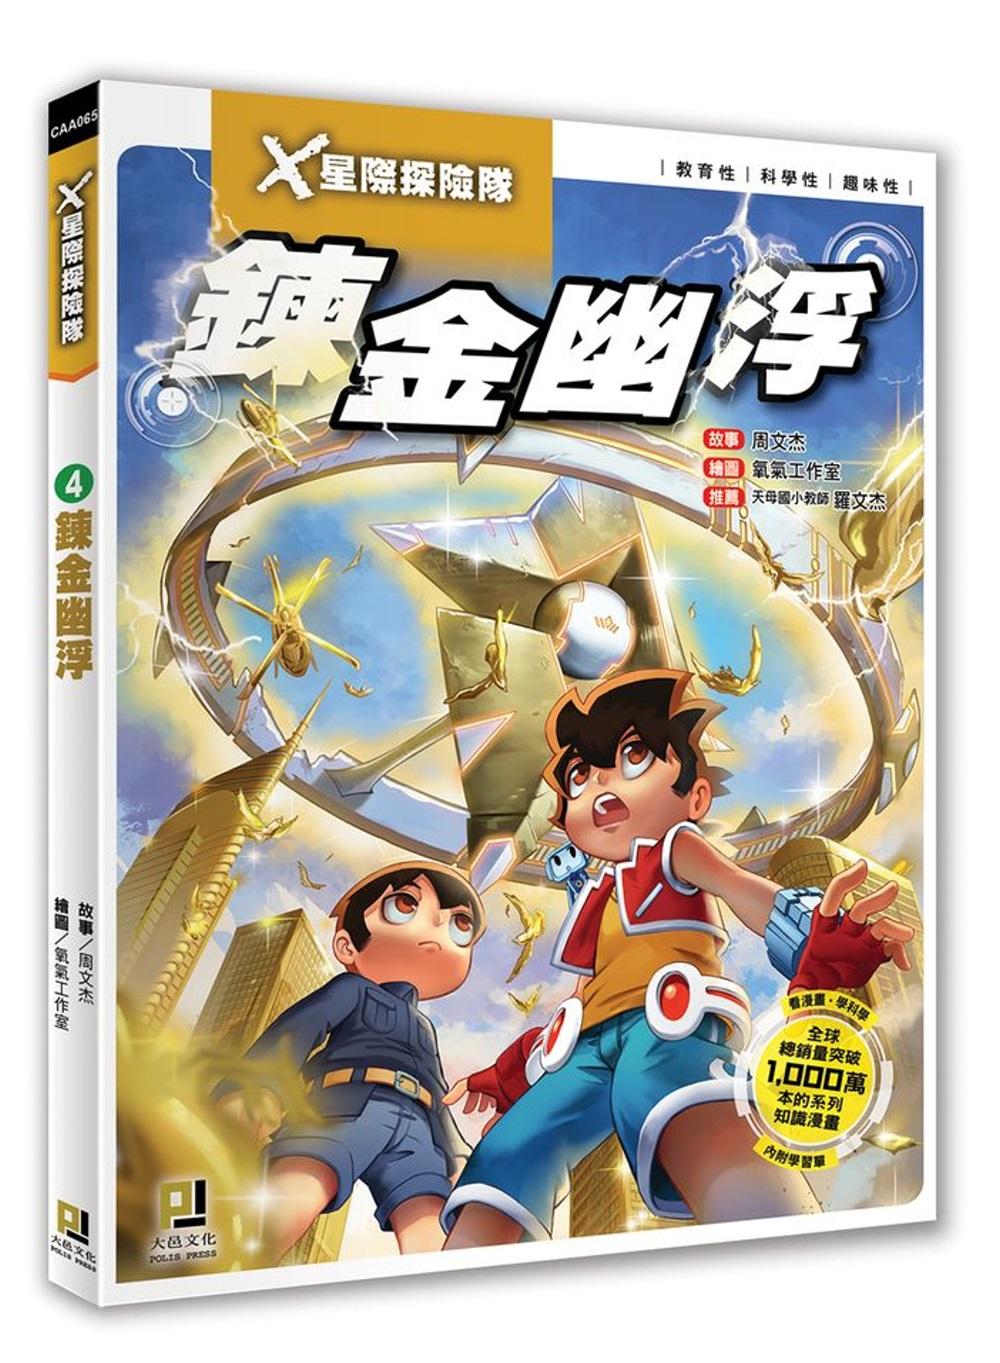 X星際探險隊:(4) 鍊金幽浮(附學習單)